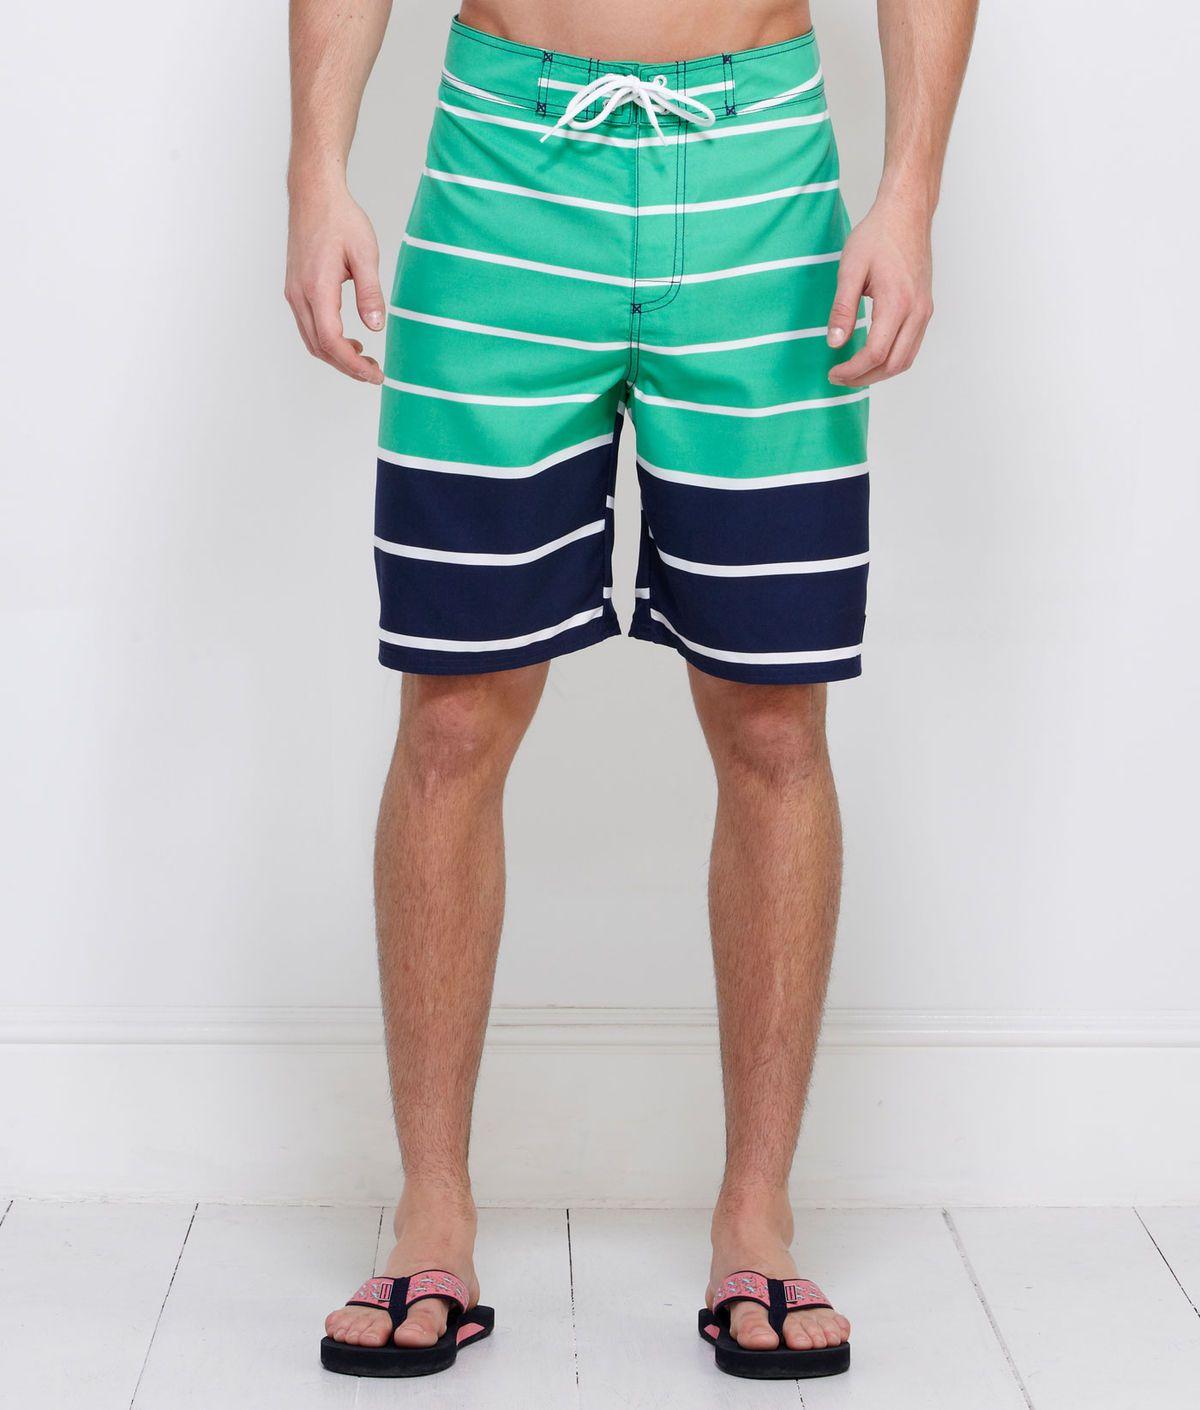 a5f792911153b Men s Swimwear  Nautical Stripe Board Shorts for Men - Vineyard Vines